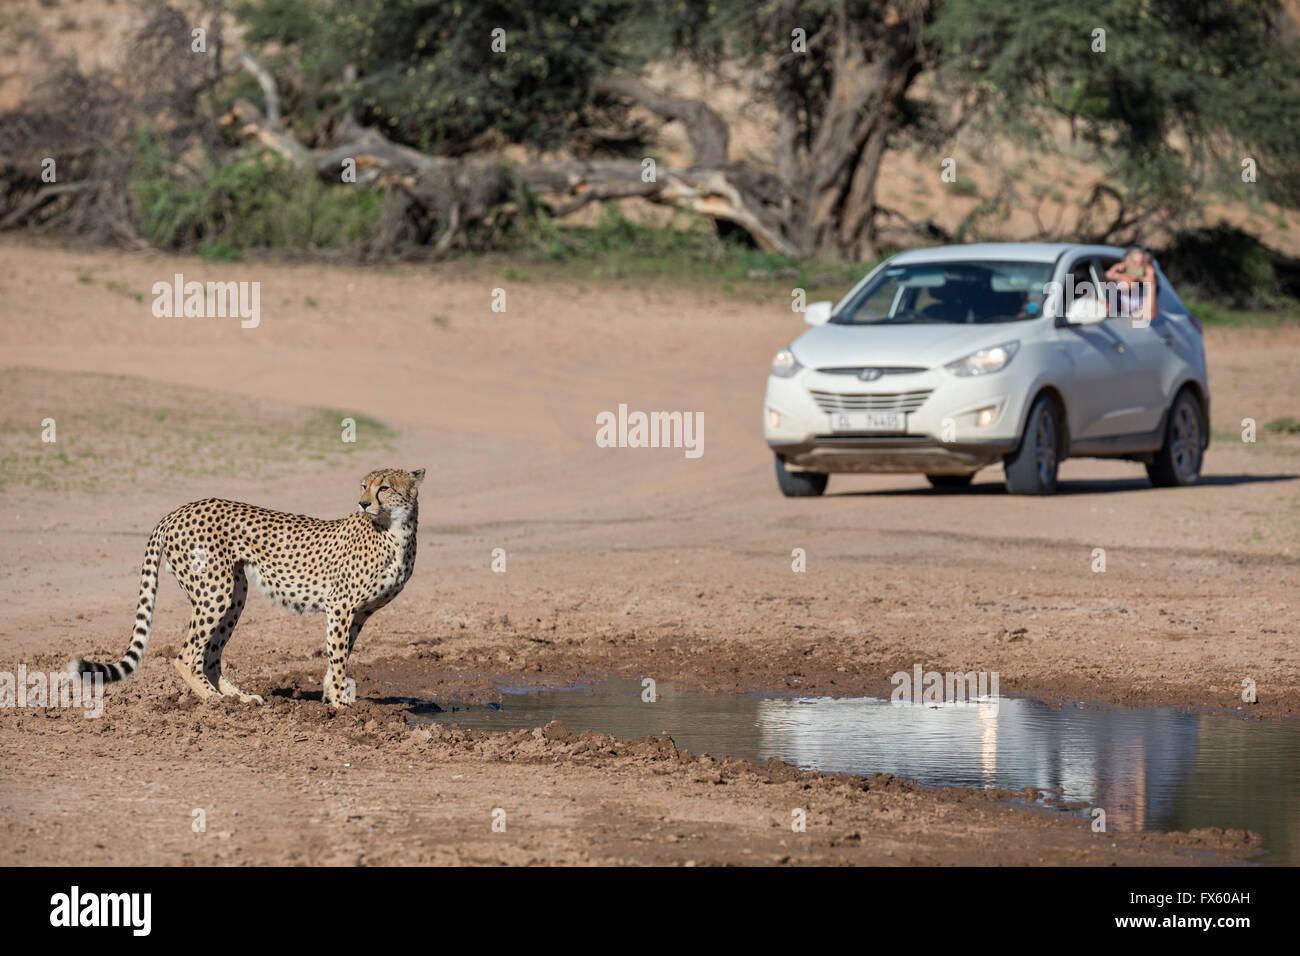 Cheetah ( Acinonyx jubatus) spotted on self drive safari, Kgalagadi Transfrontier Park, South Africa - Stock Image